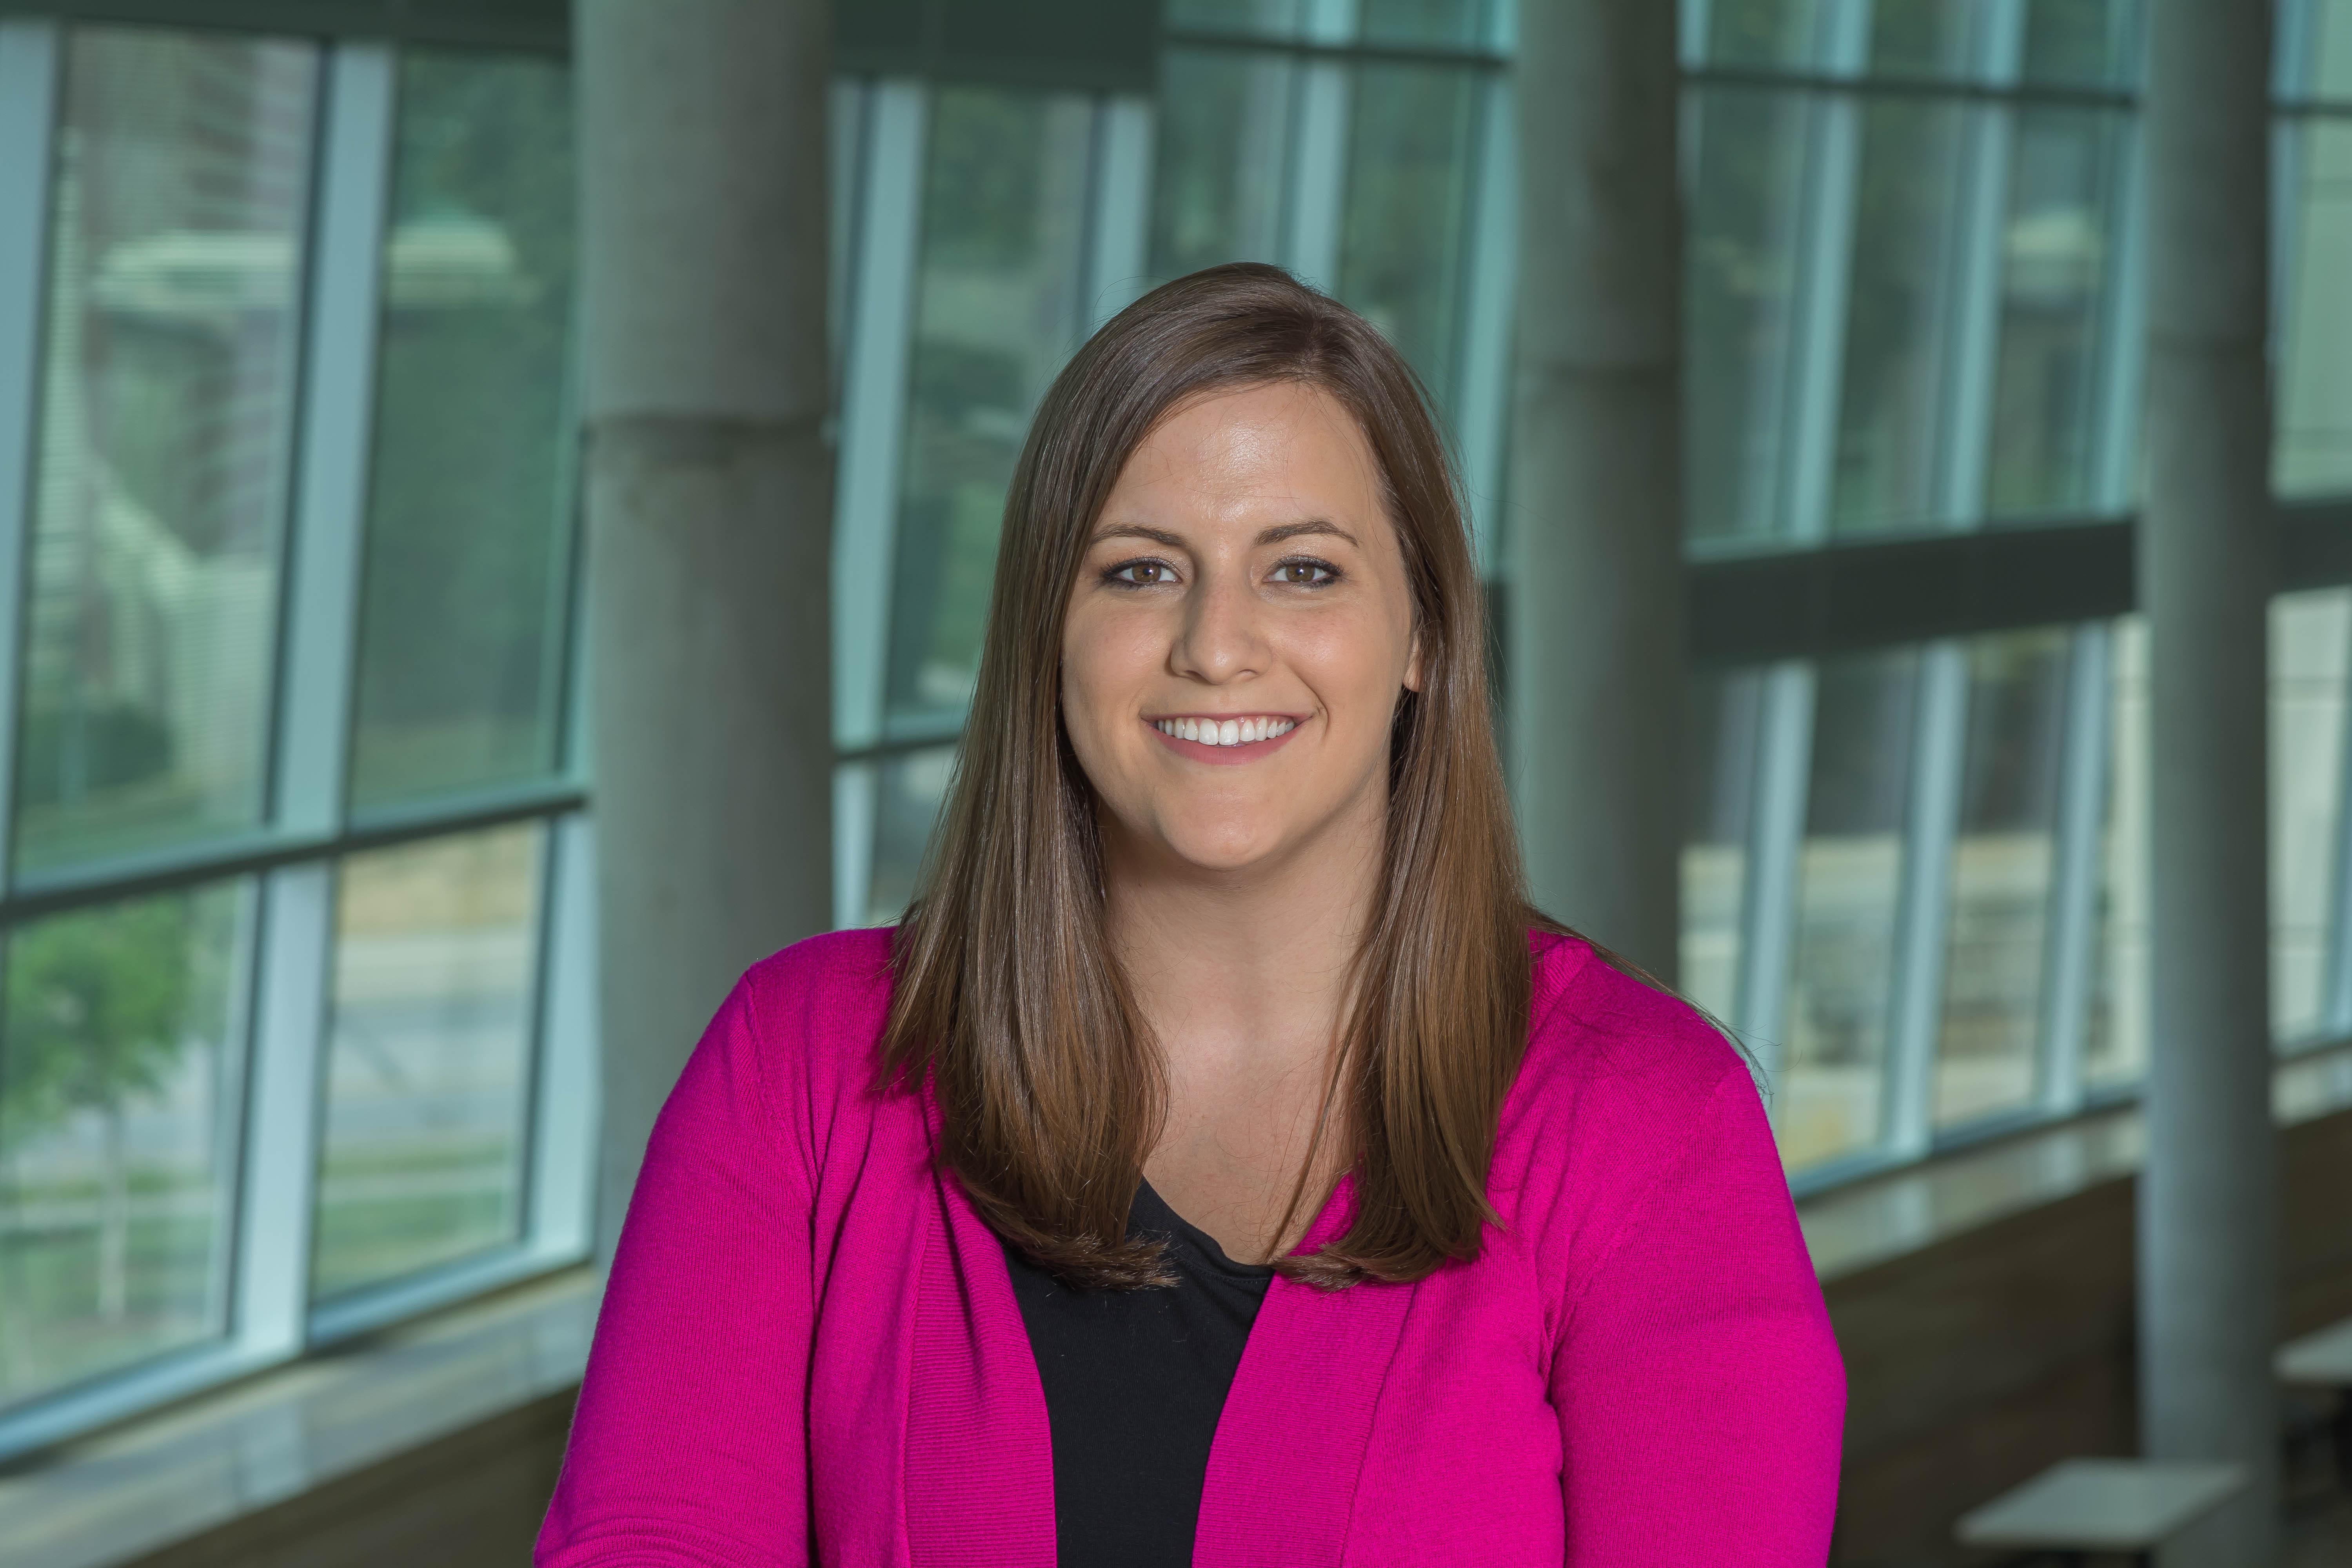 Leslie Van Winkle Updates on Region 1 Activities